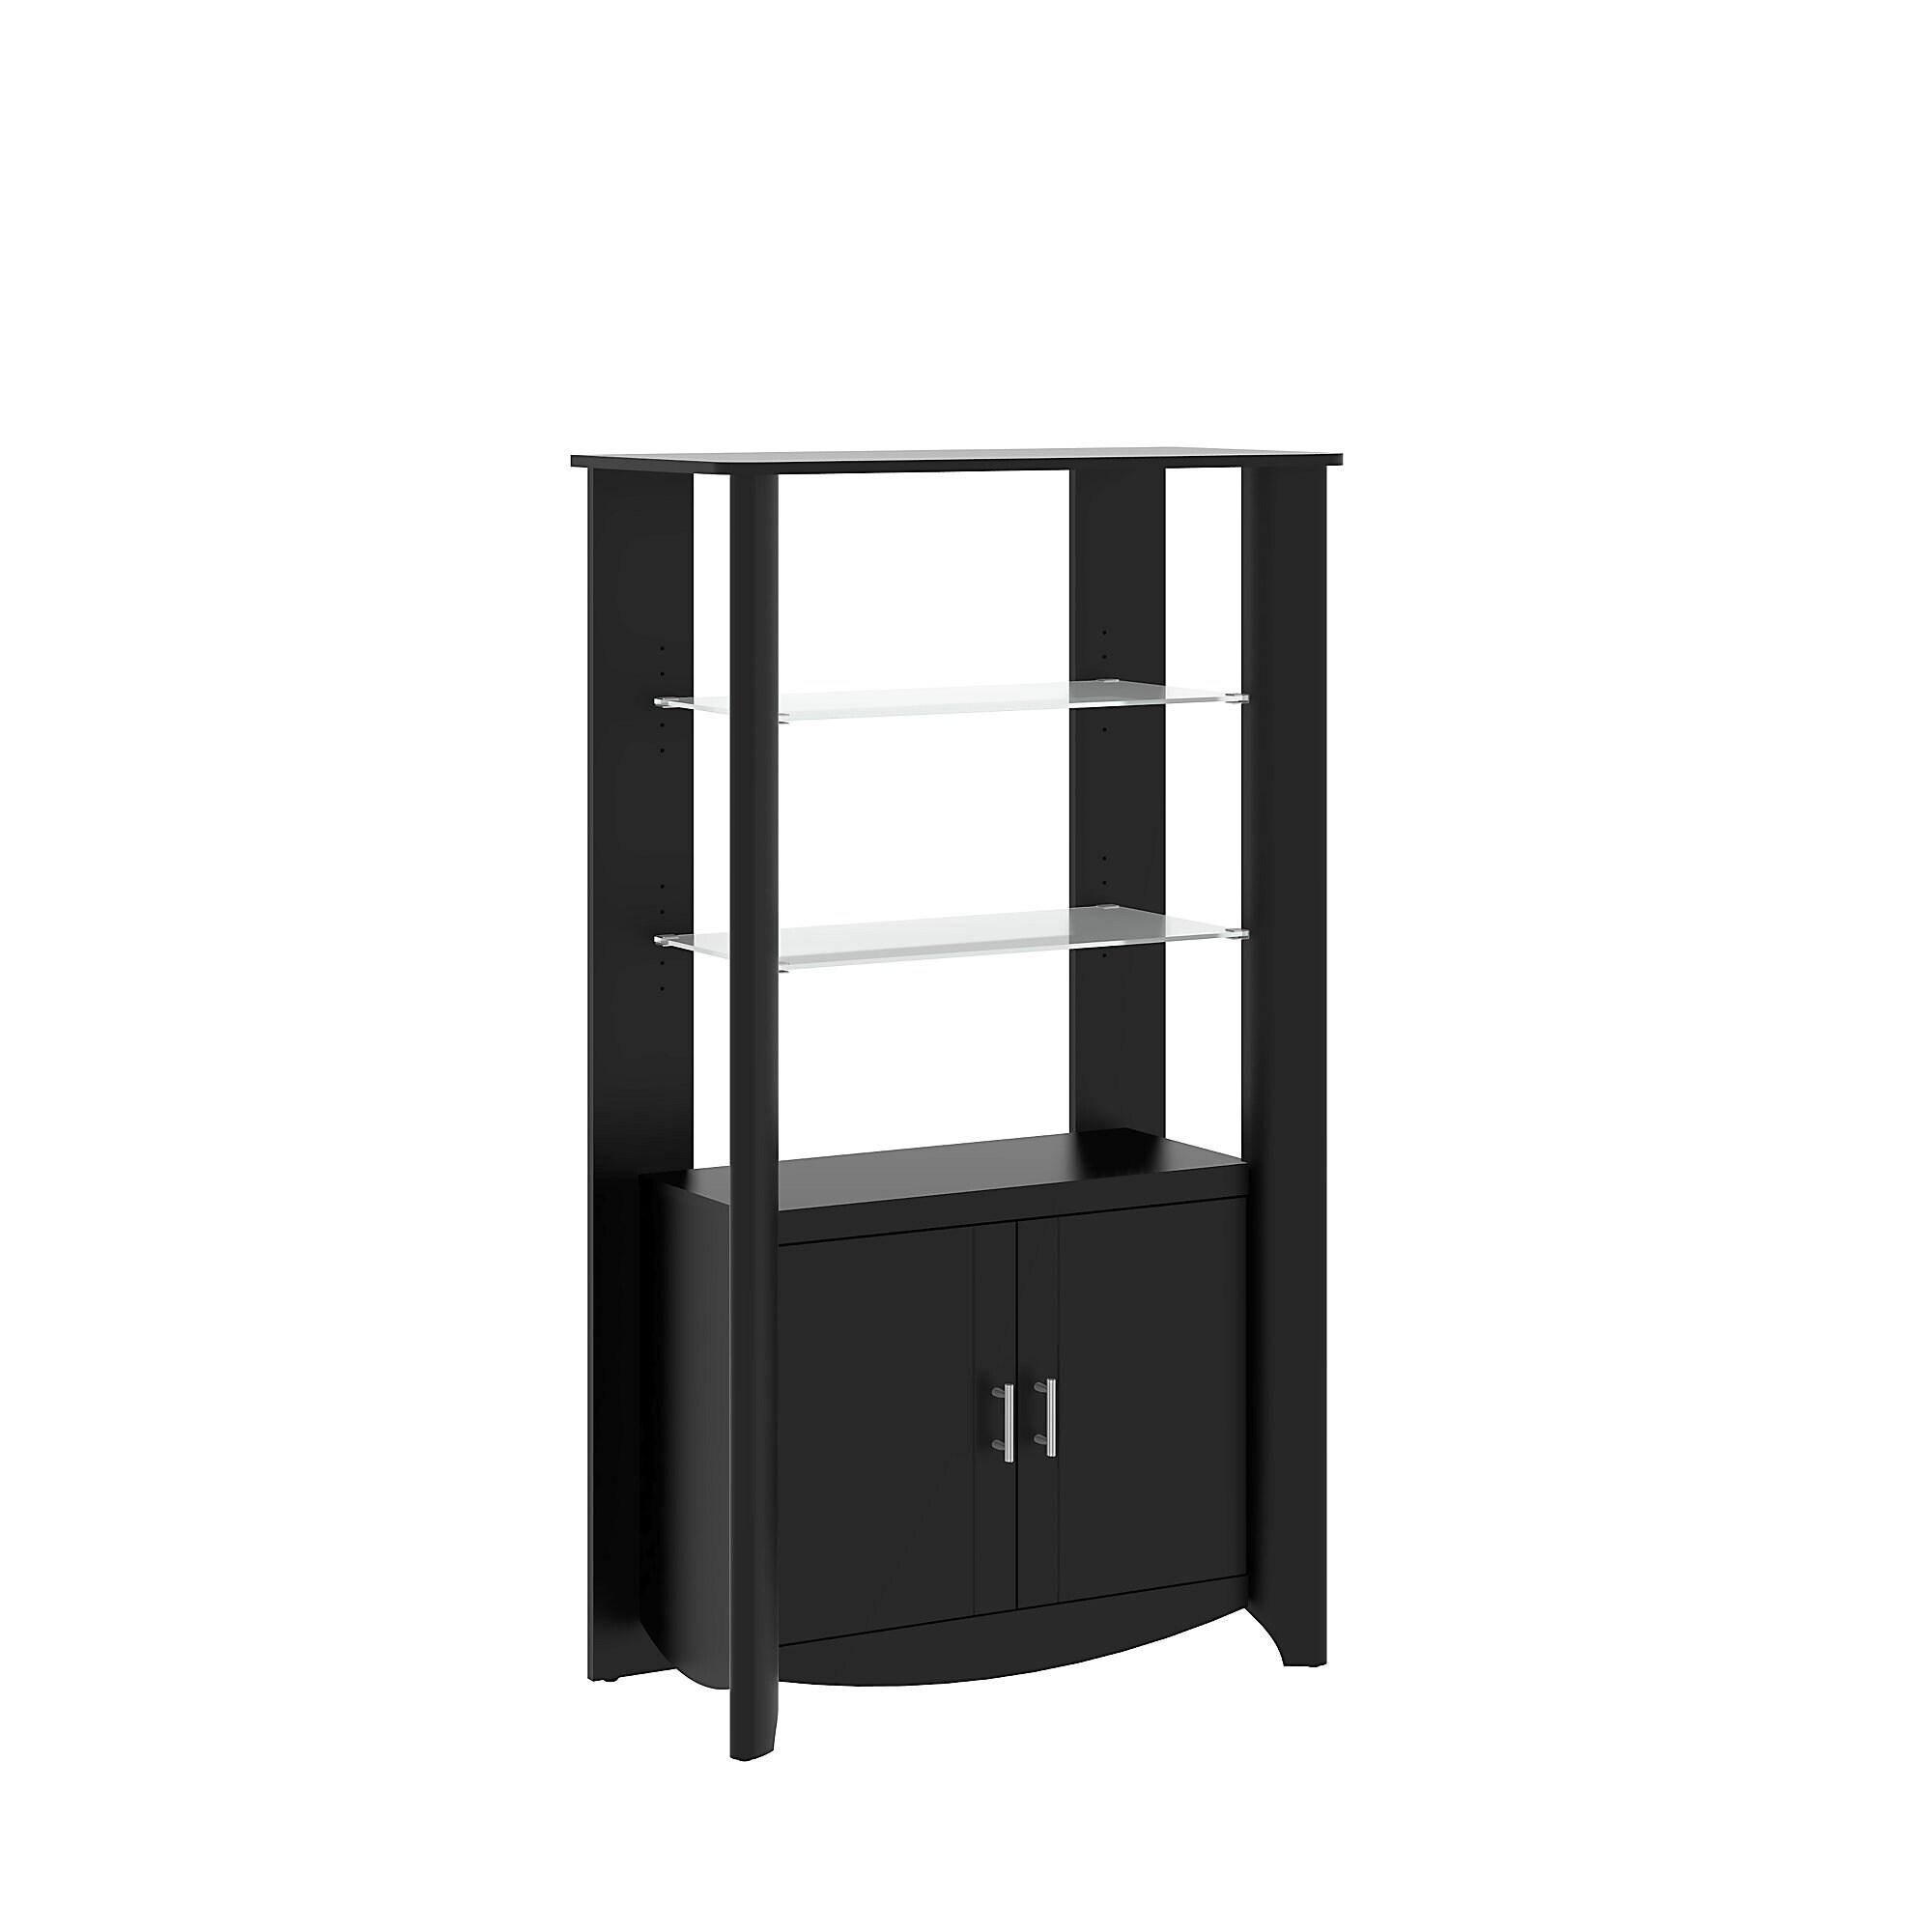 Bush Furniture Aero Tall Library Storage Cabinet with Doo...